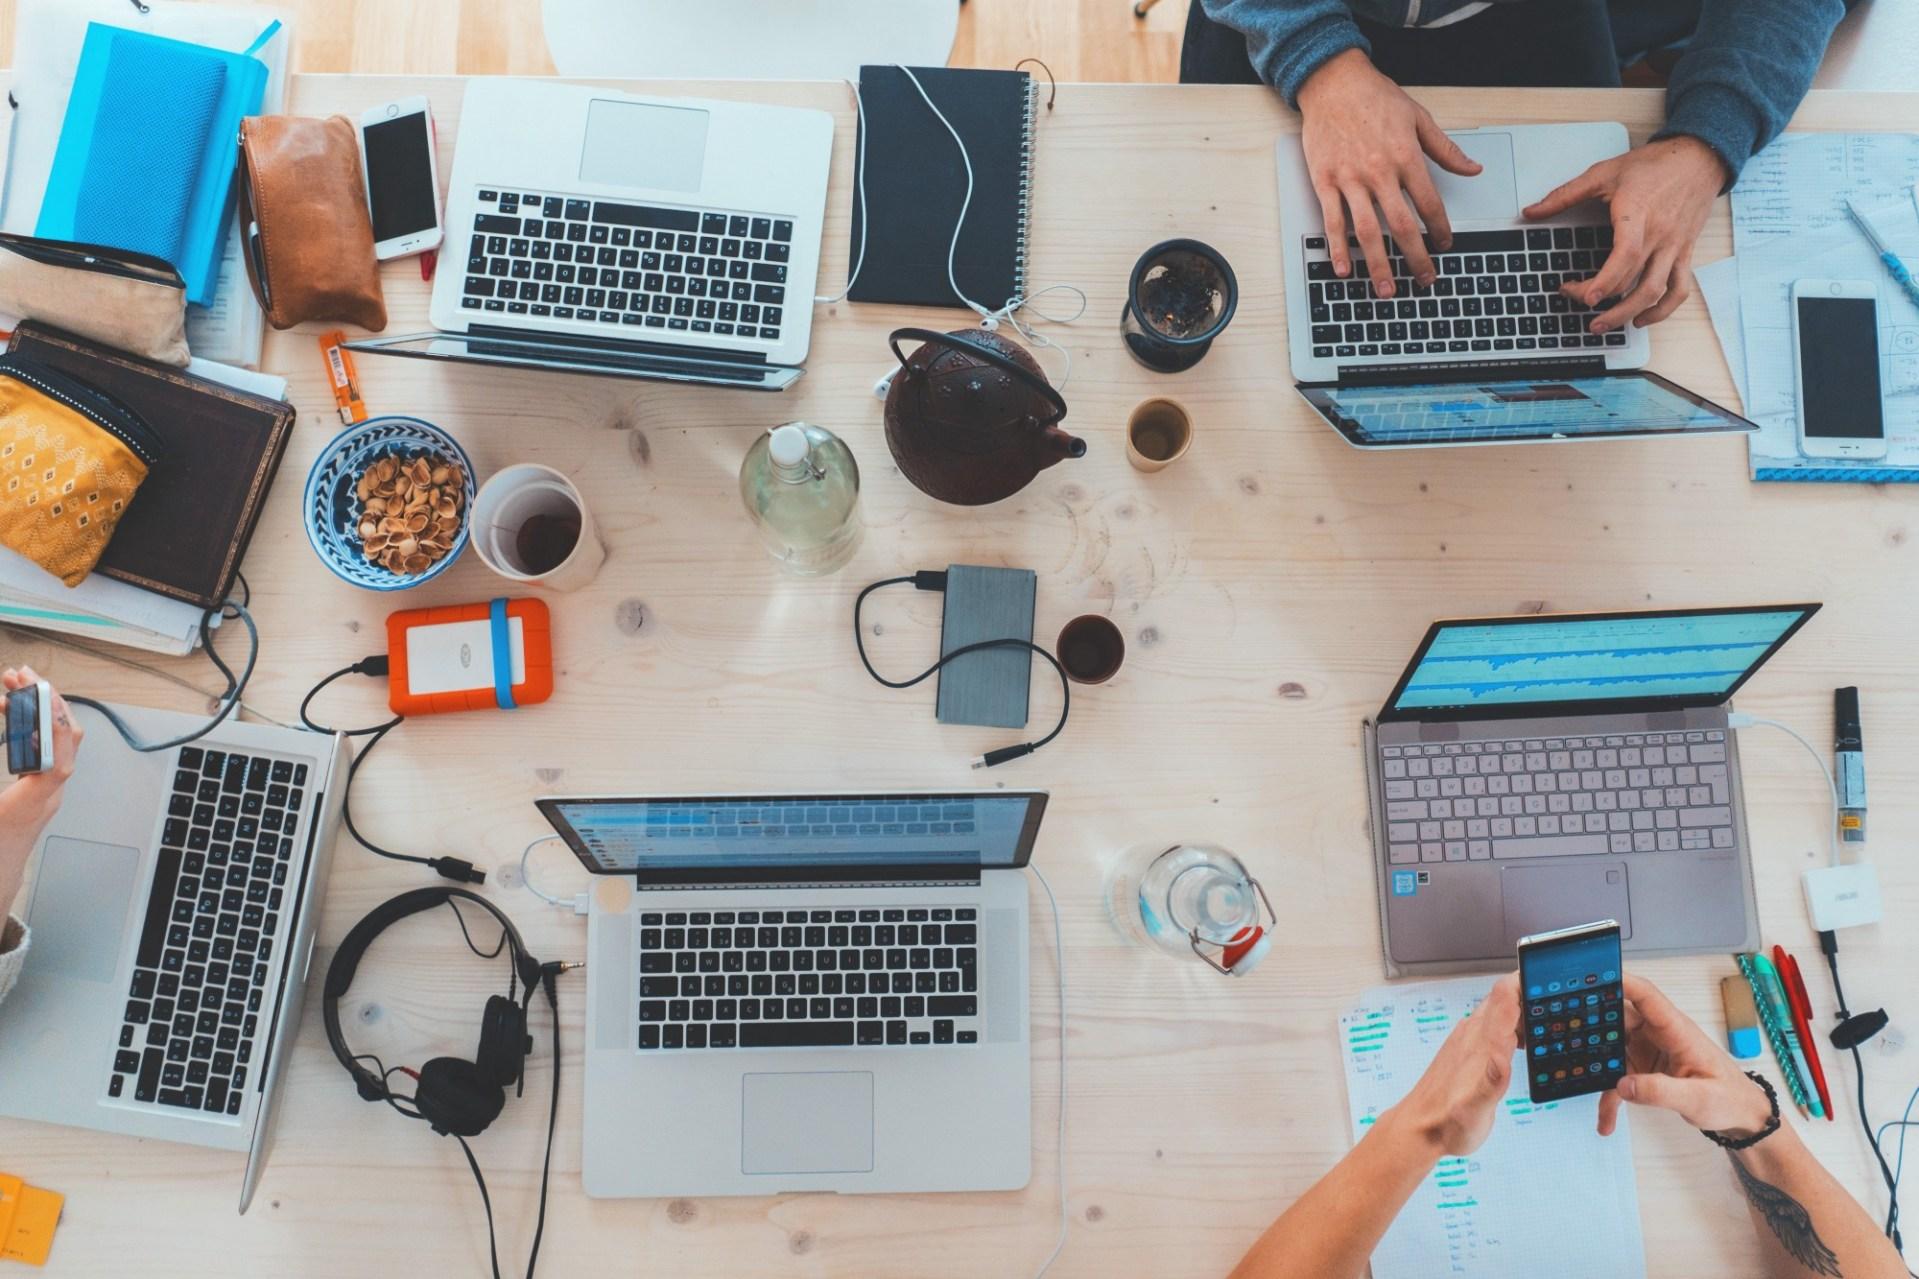 Refactoring Backend Engineering Hiring at Slack